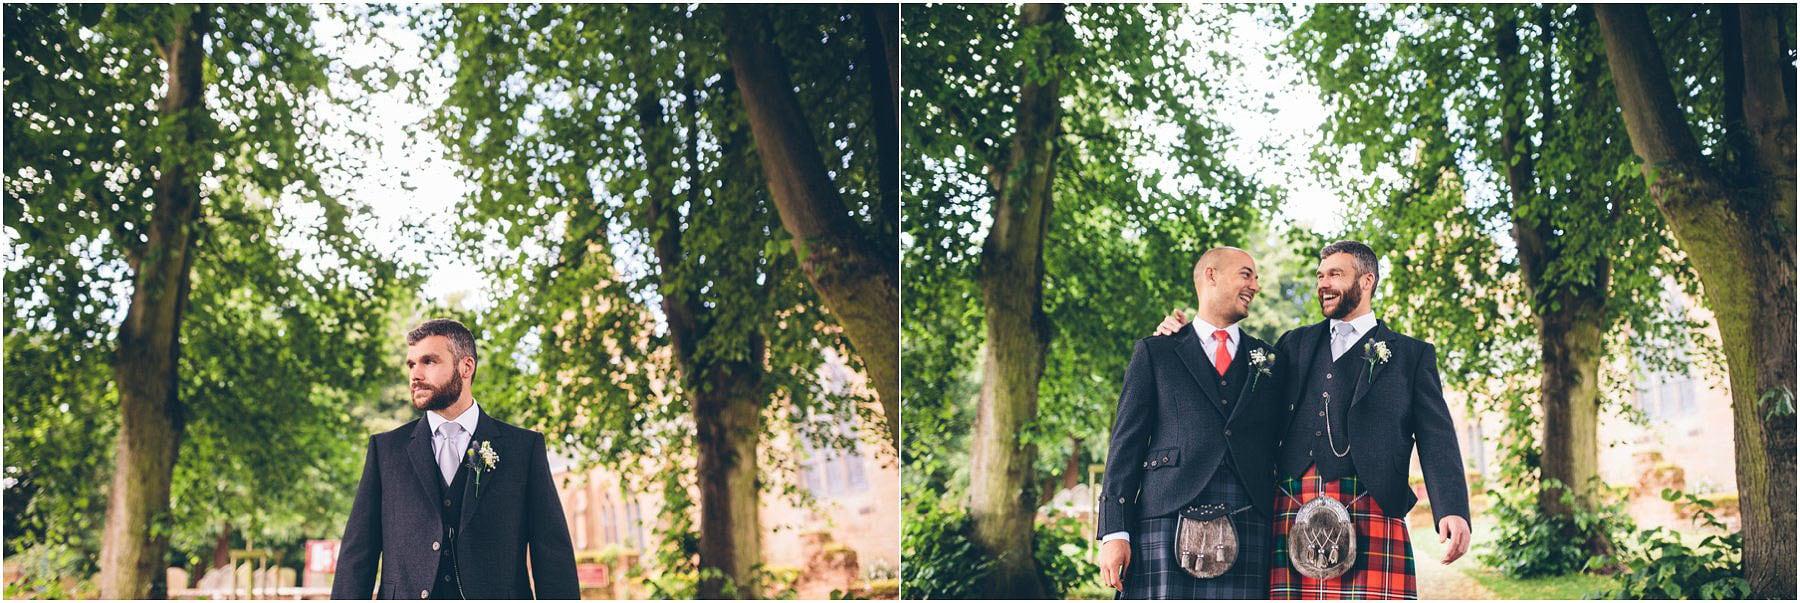 Swallows_Nest_Barn_Wedding_Photography_0031